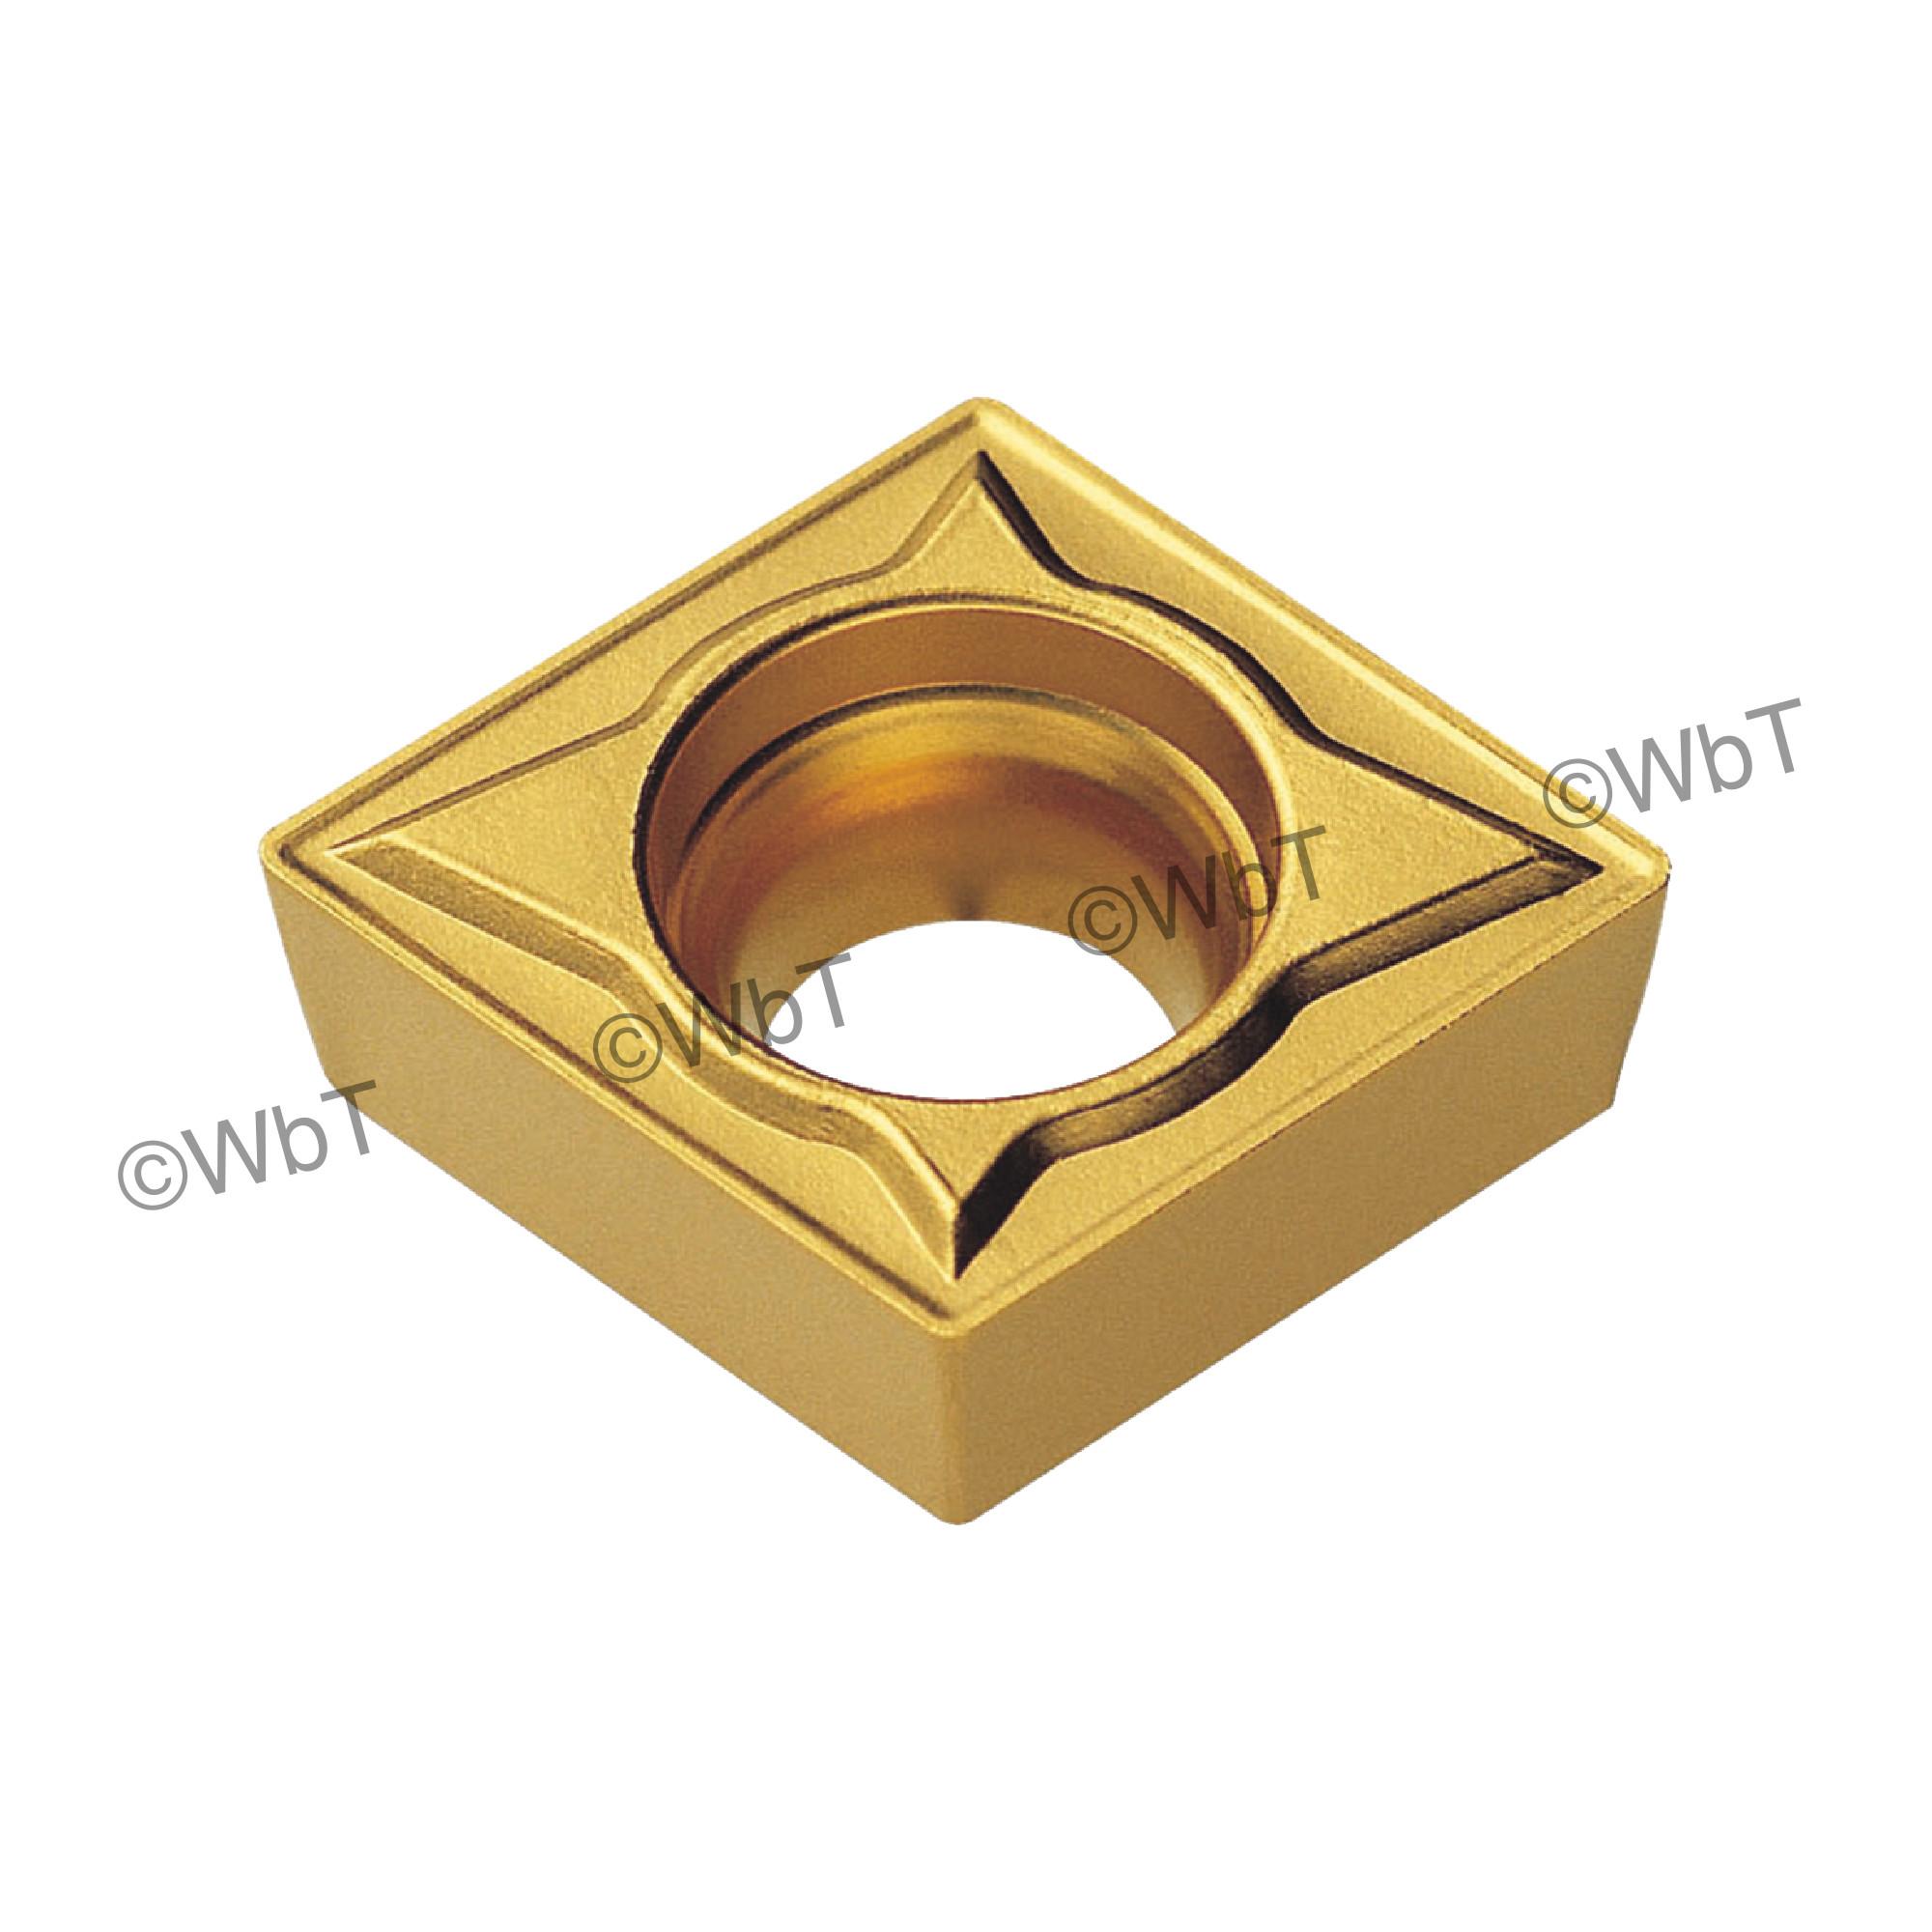 AKUMA - CCMT3(2.5)1-MP1 CT25M - 80° Diamond / Indexable Carbide Turning Insert